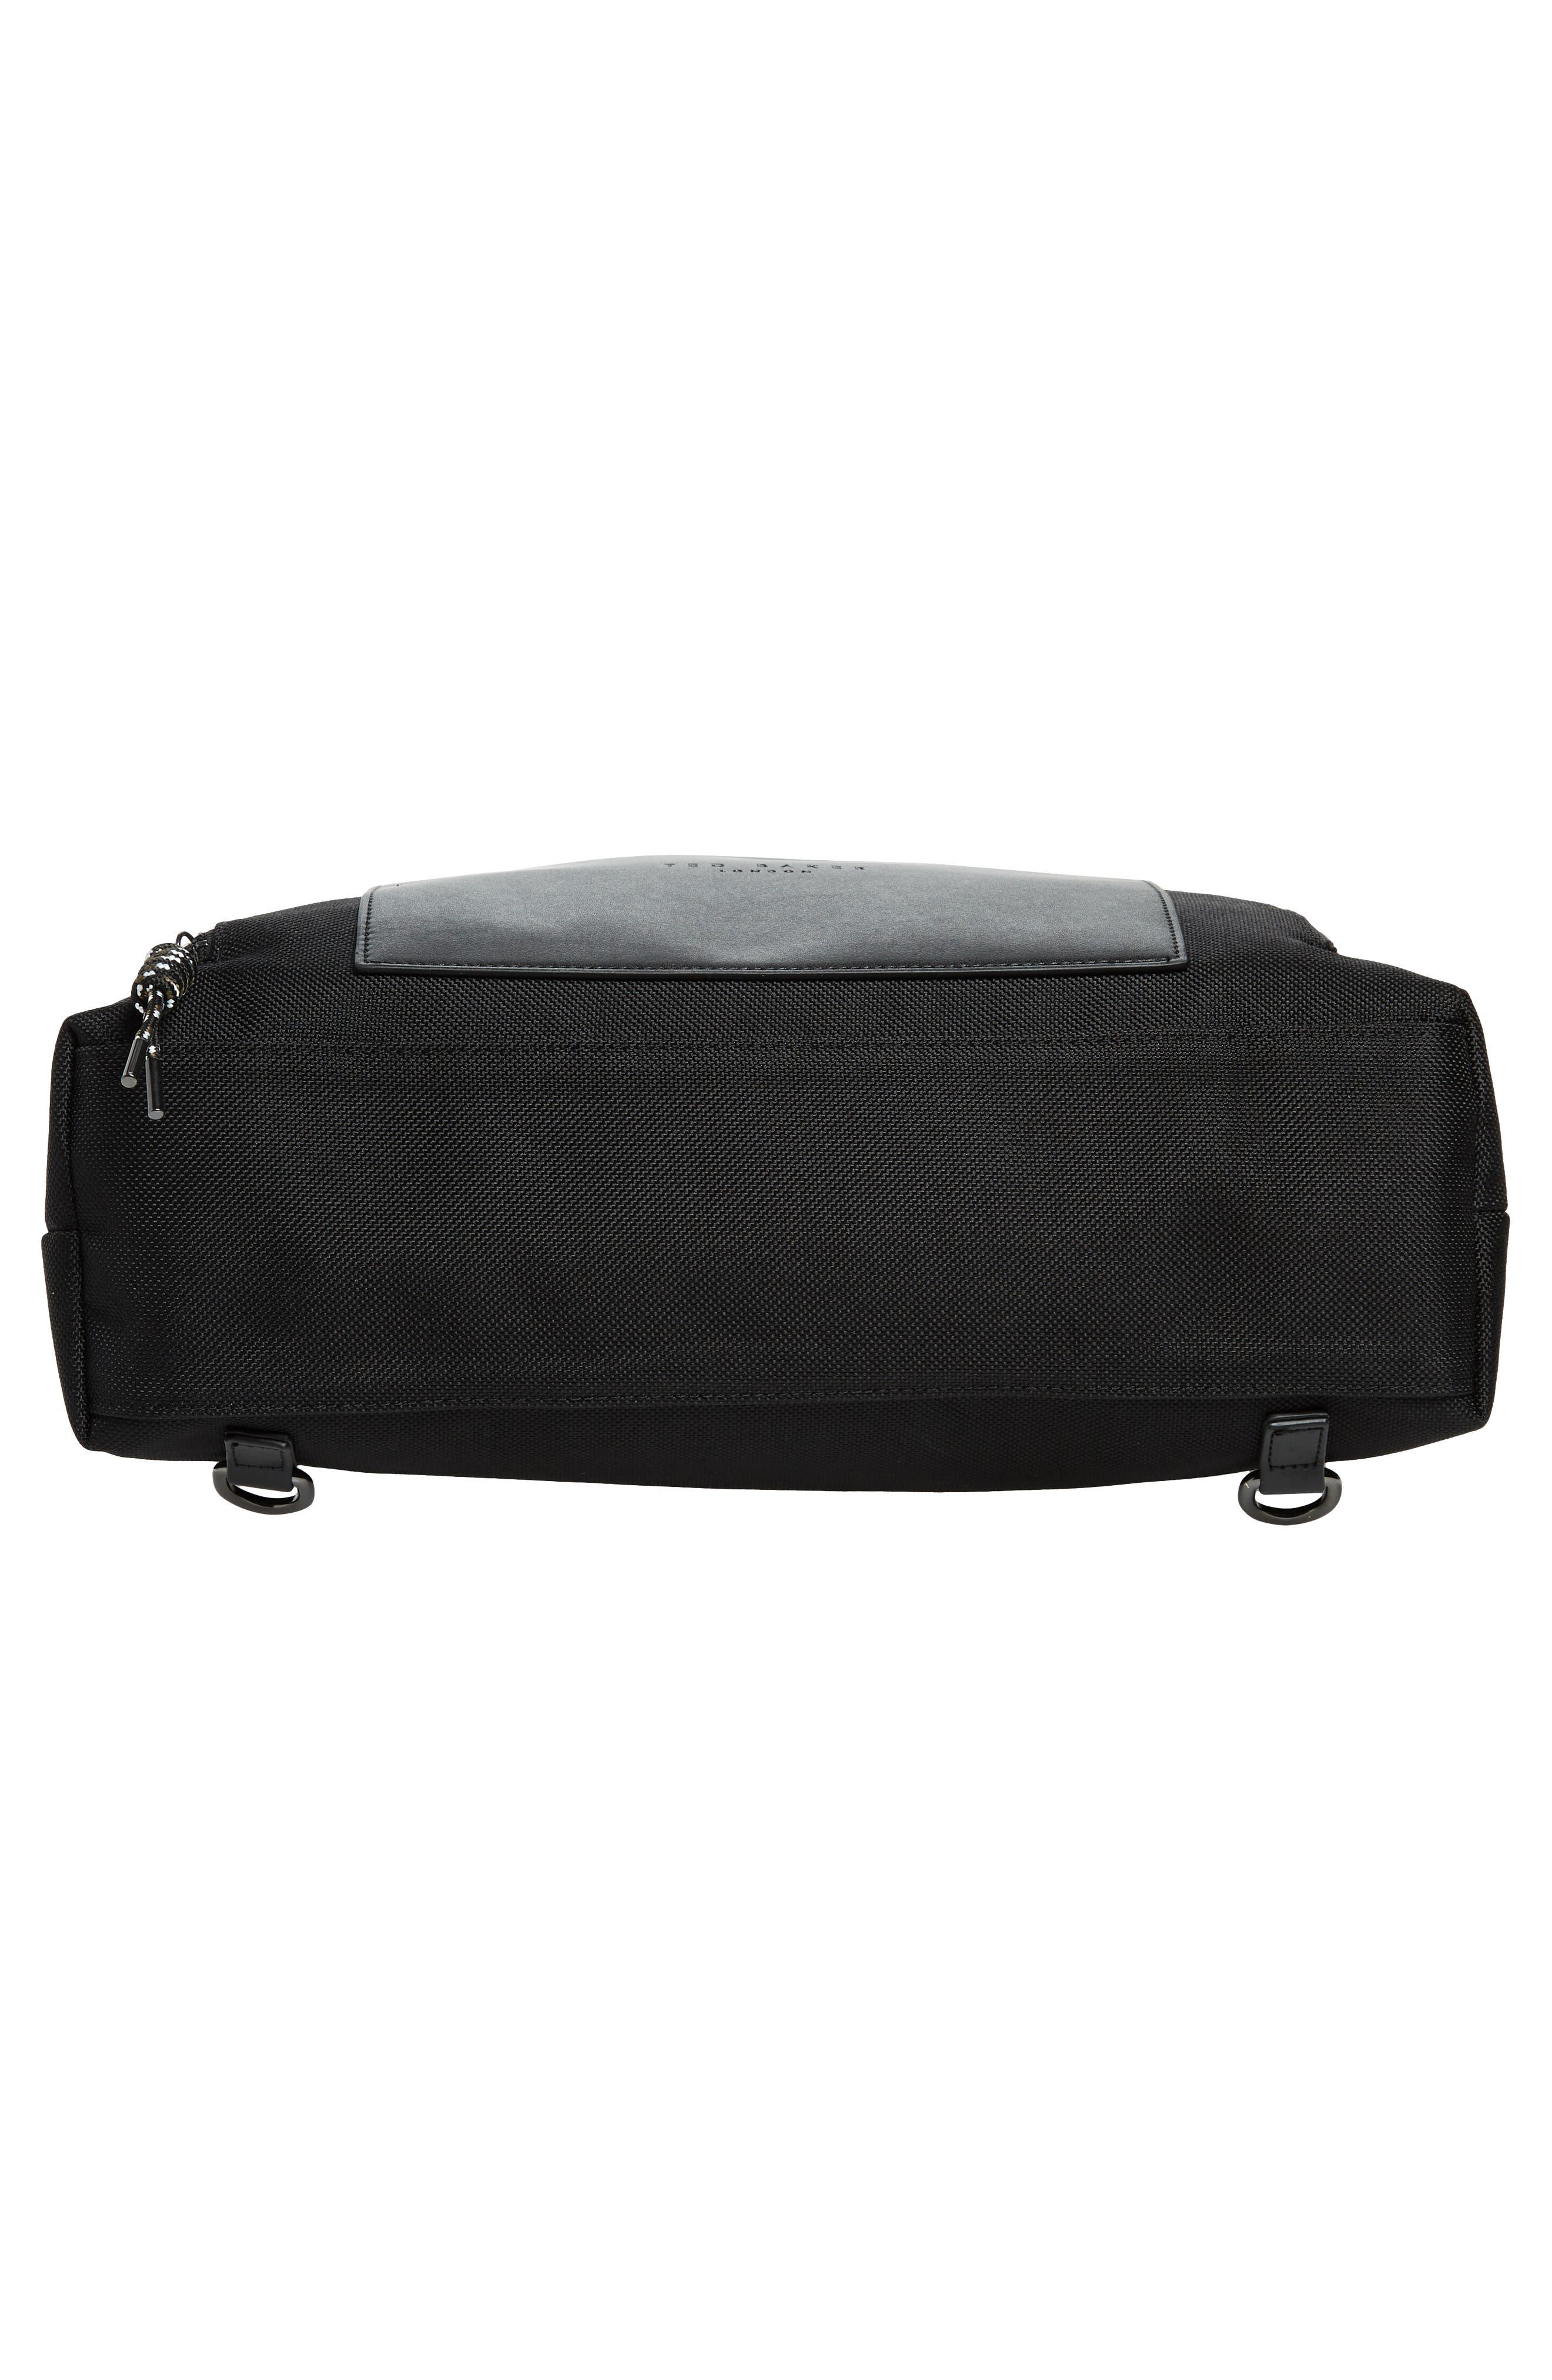 Tidee Convertible Backpack,                             Alternate thumbnail 6, color,                             BLACK